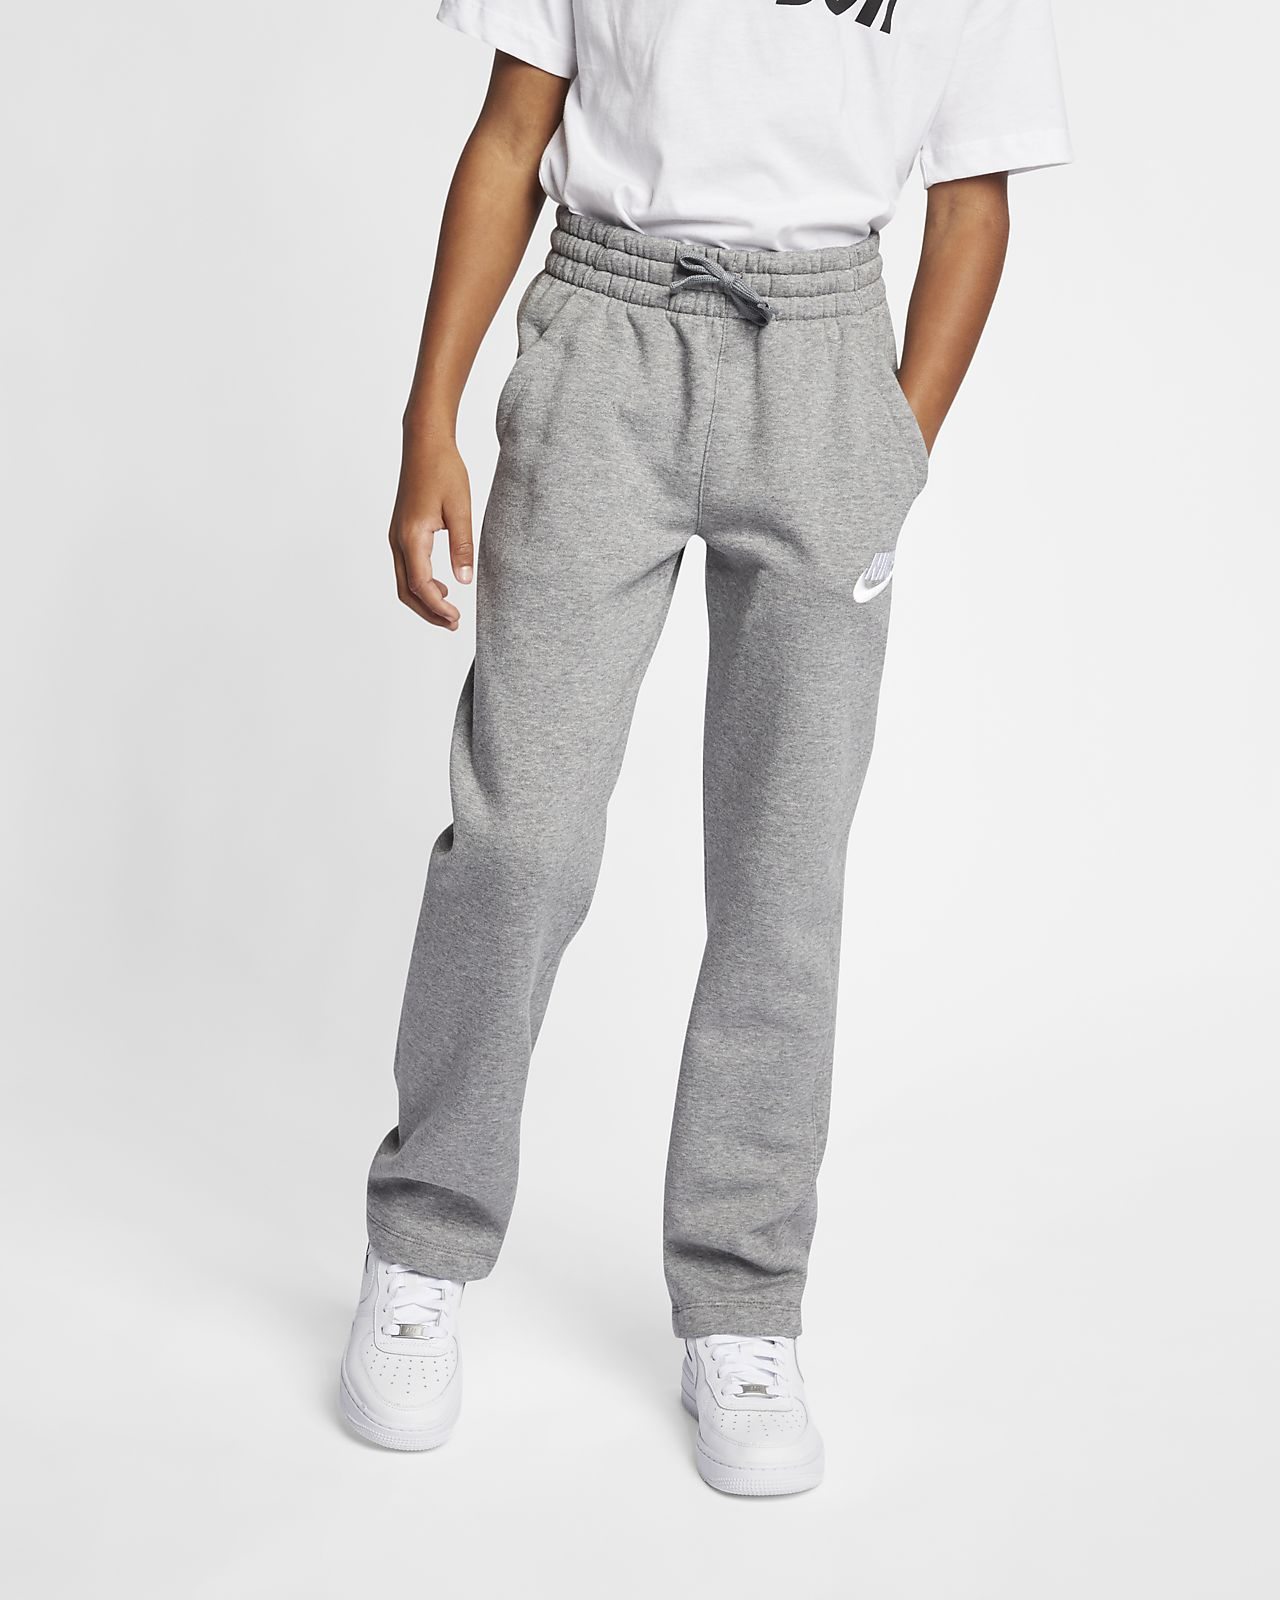 Nike Sportswear Club Fleece Big Kids\u0027 (Boys\u0027) Pants